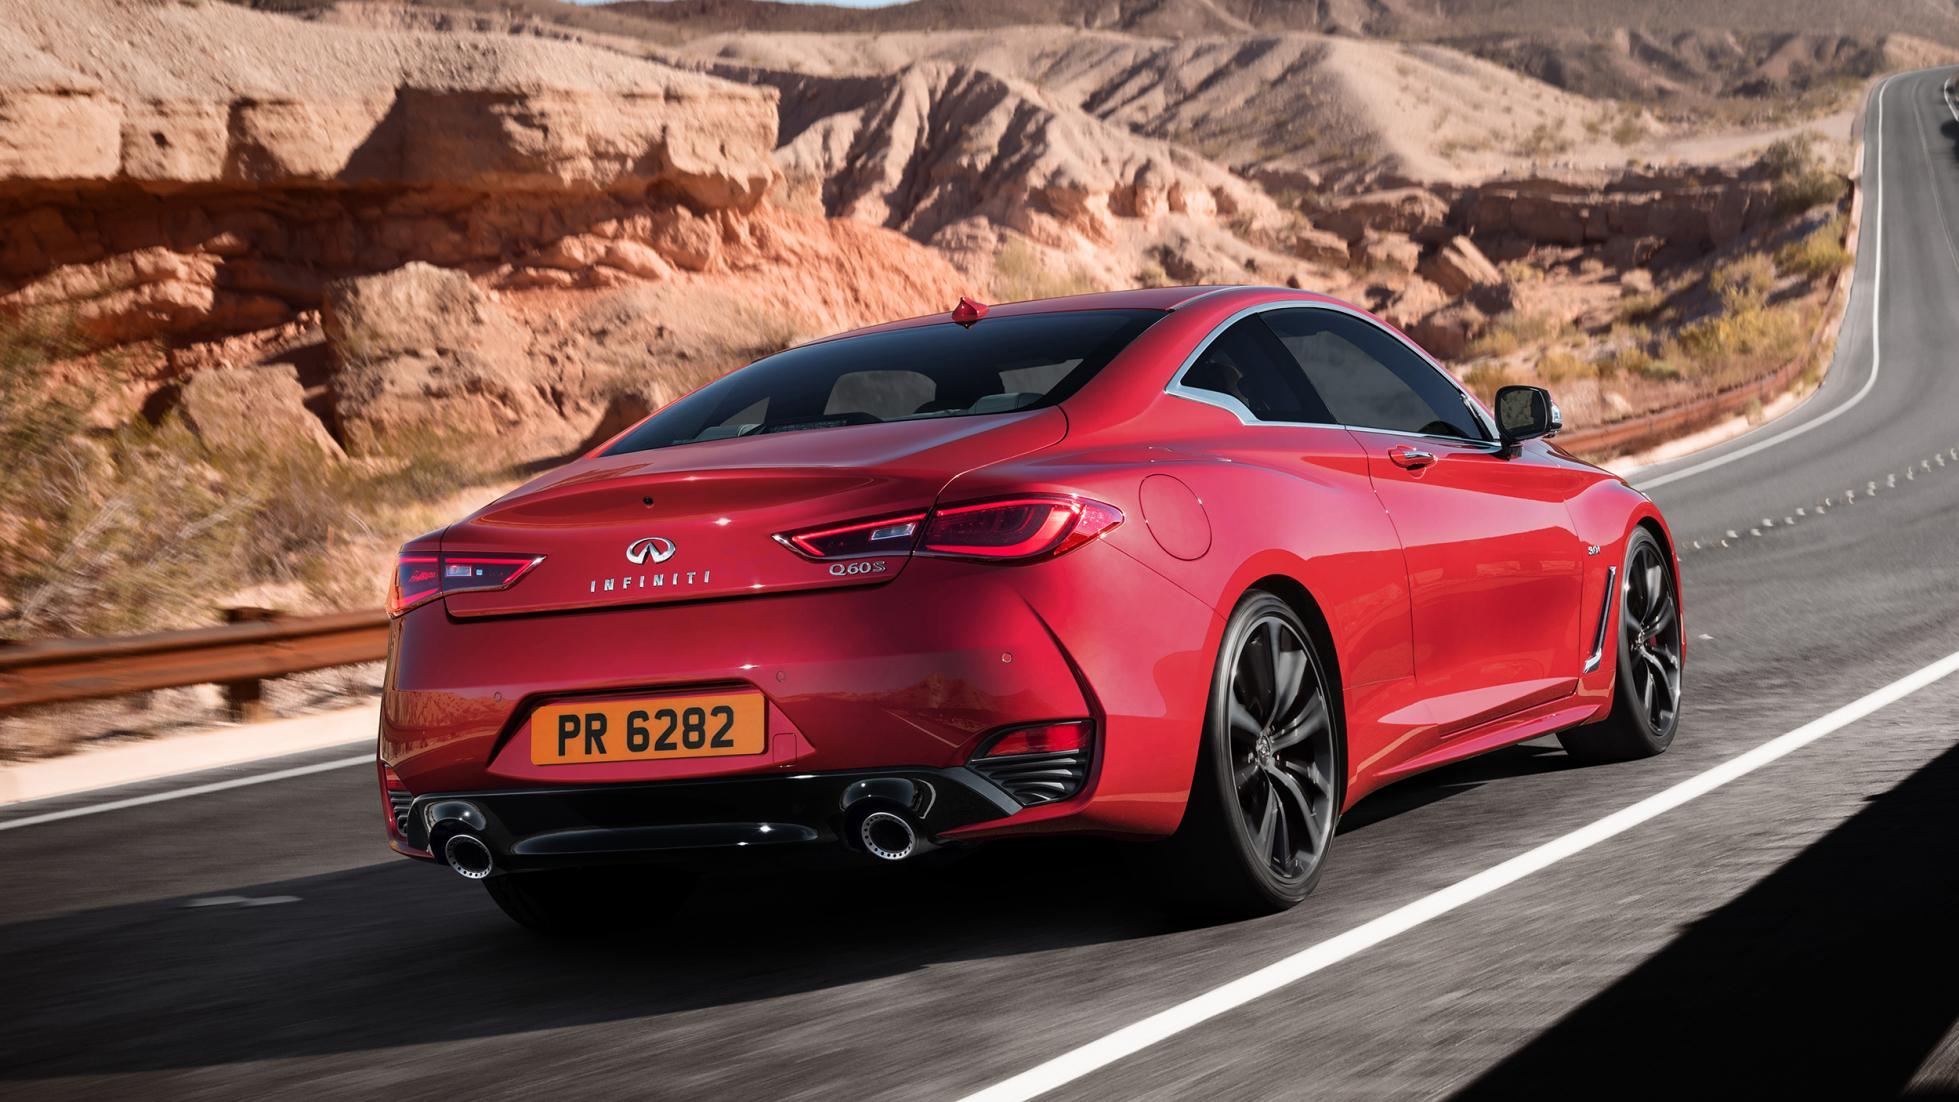 В Англии стартуют продажи купе Инфинити Q60 Coupe 2017